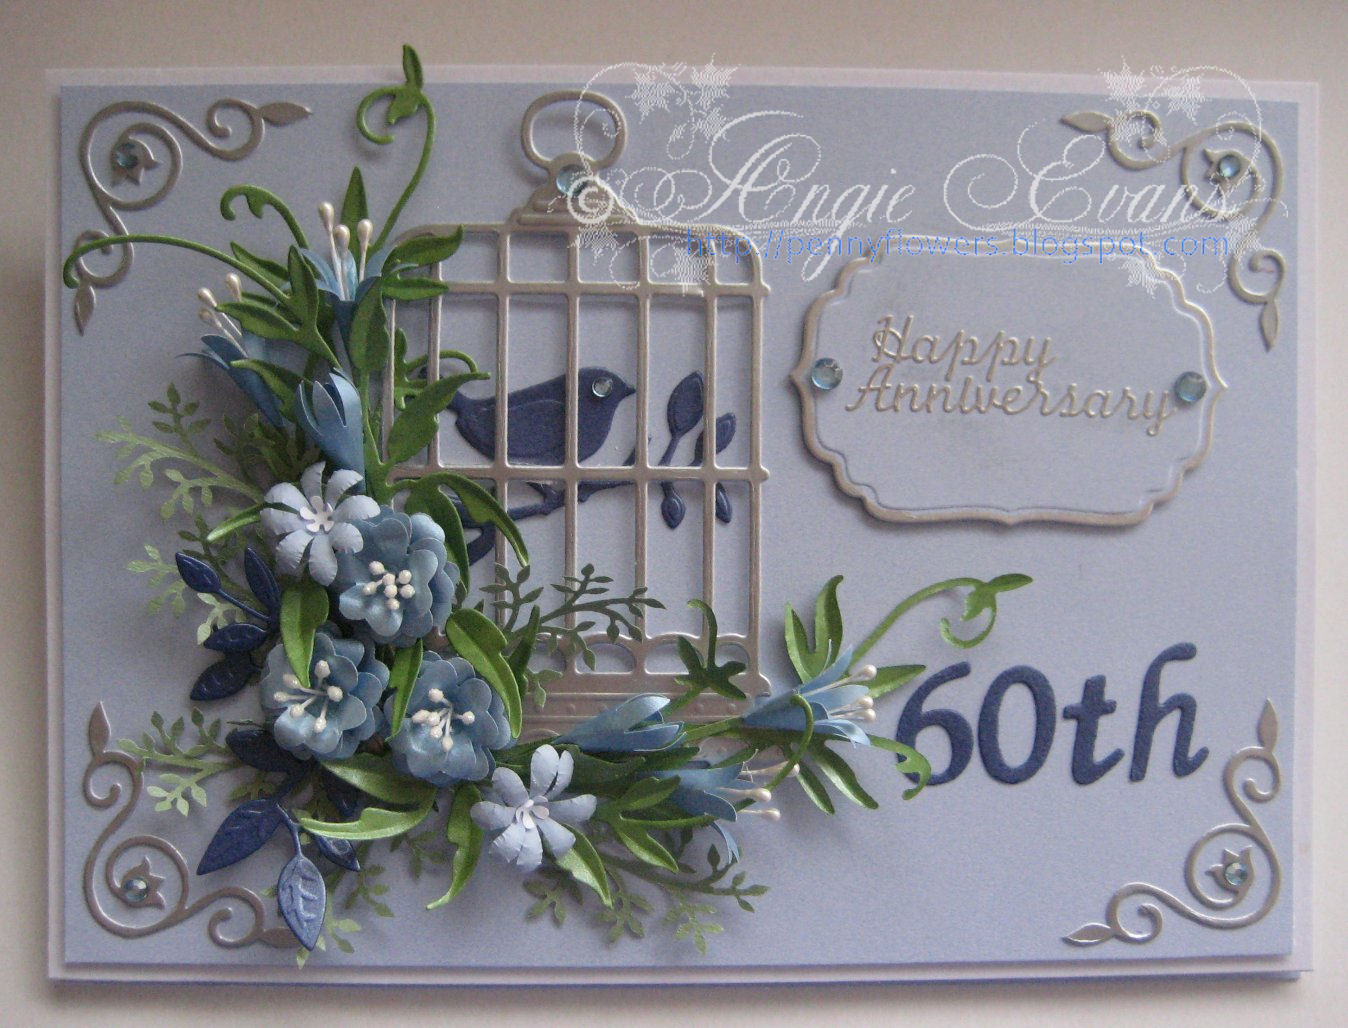 60th Wedding Anniversary.